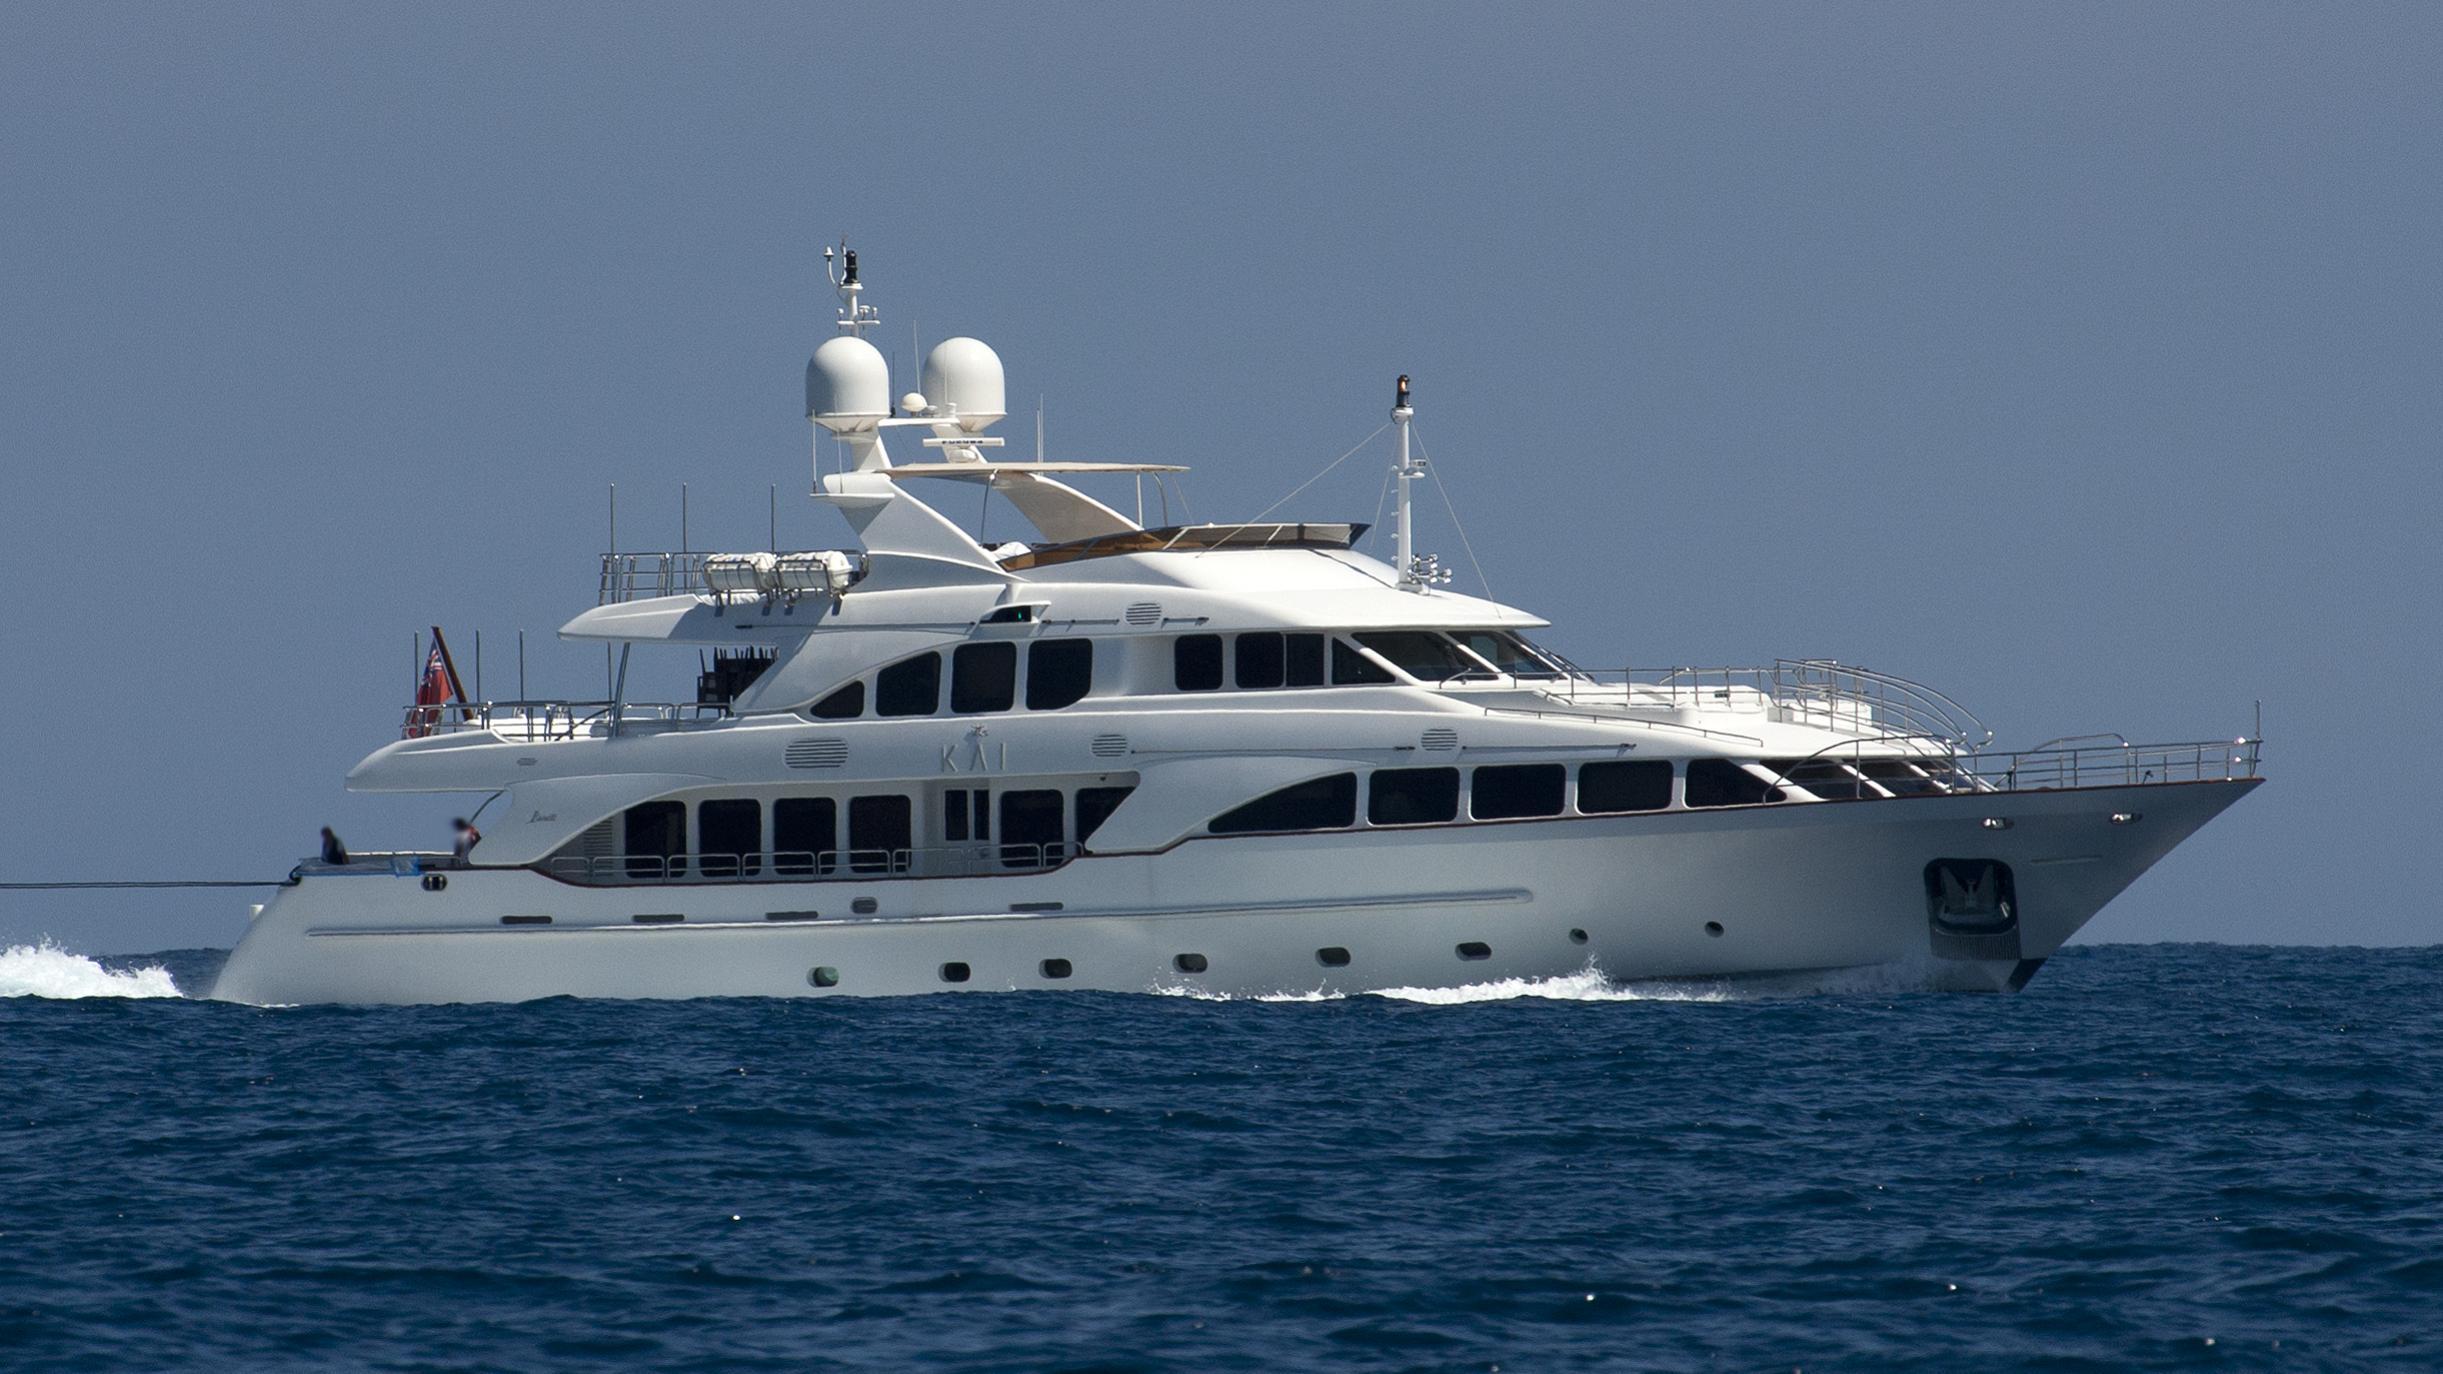 pure bliss kai motoryacht benetti classic 2007 37m cruising half profile